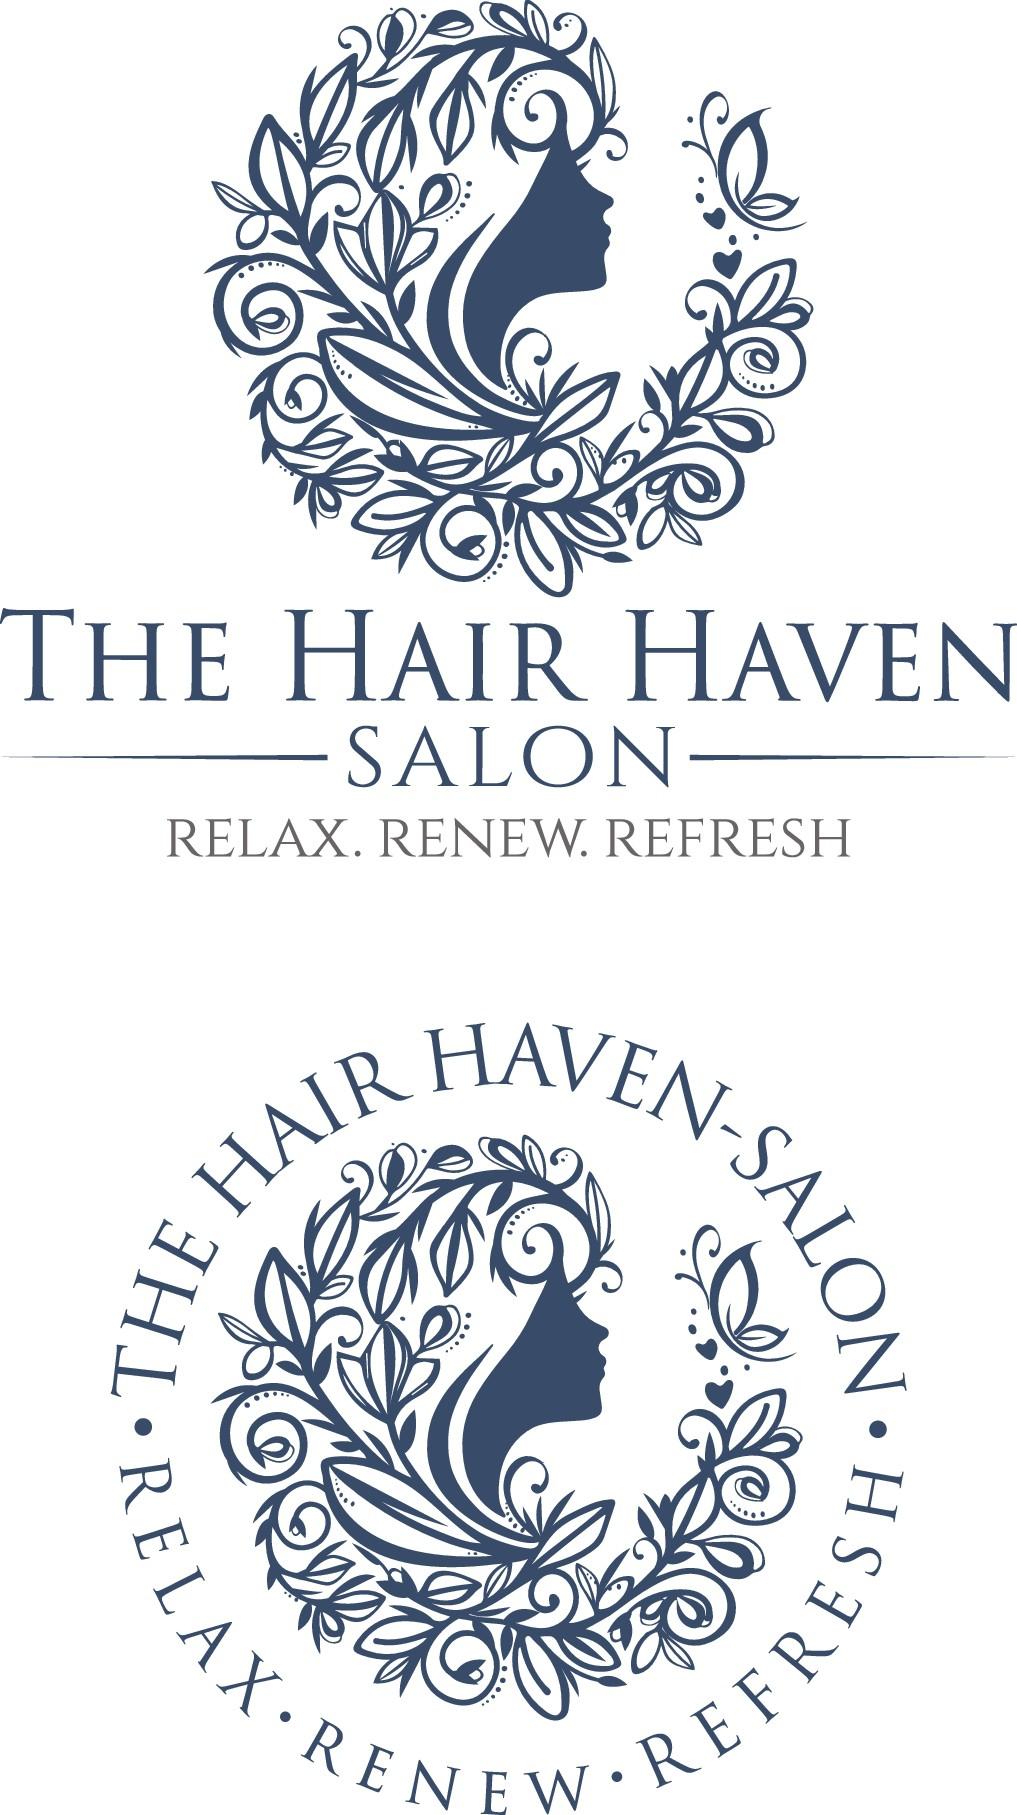 A Salon that pampers mommas needs a fresh logo💕